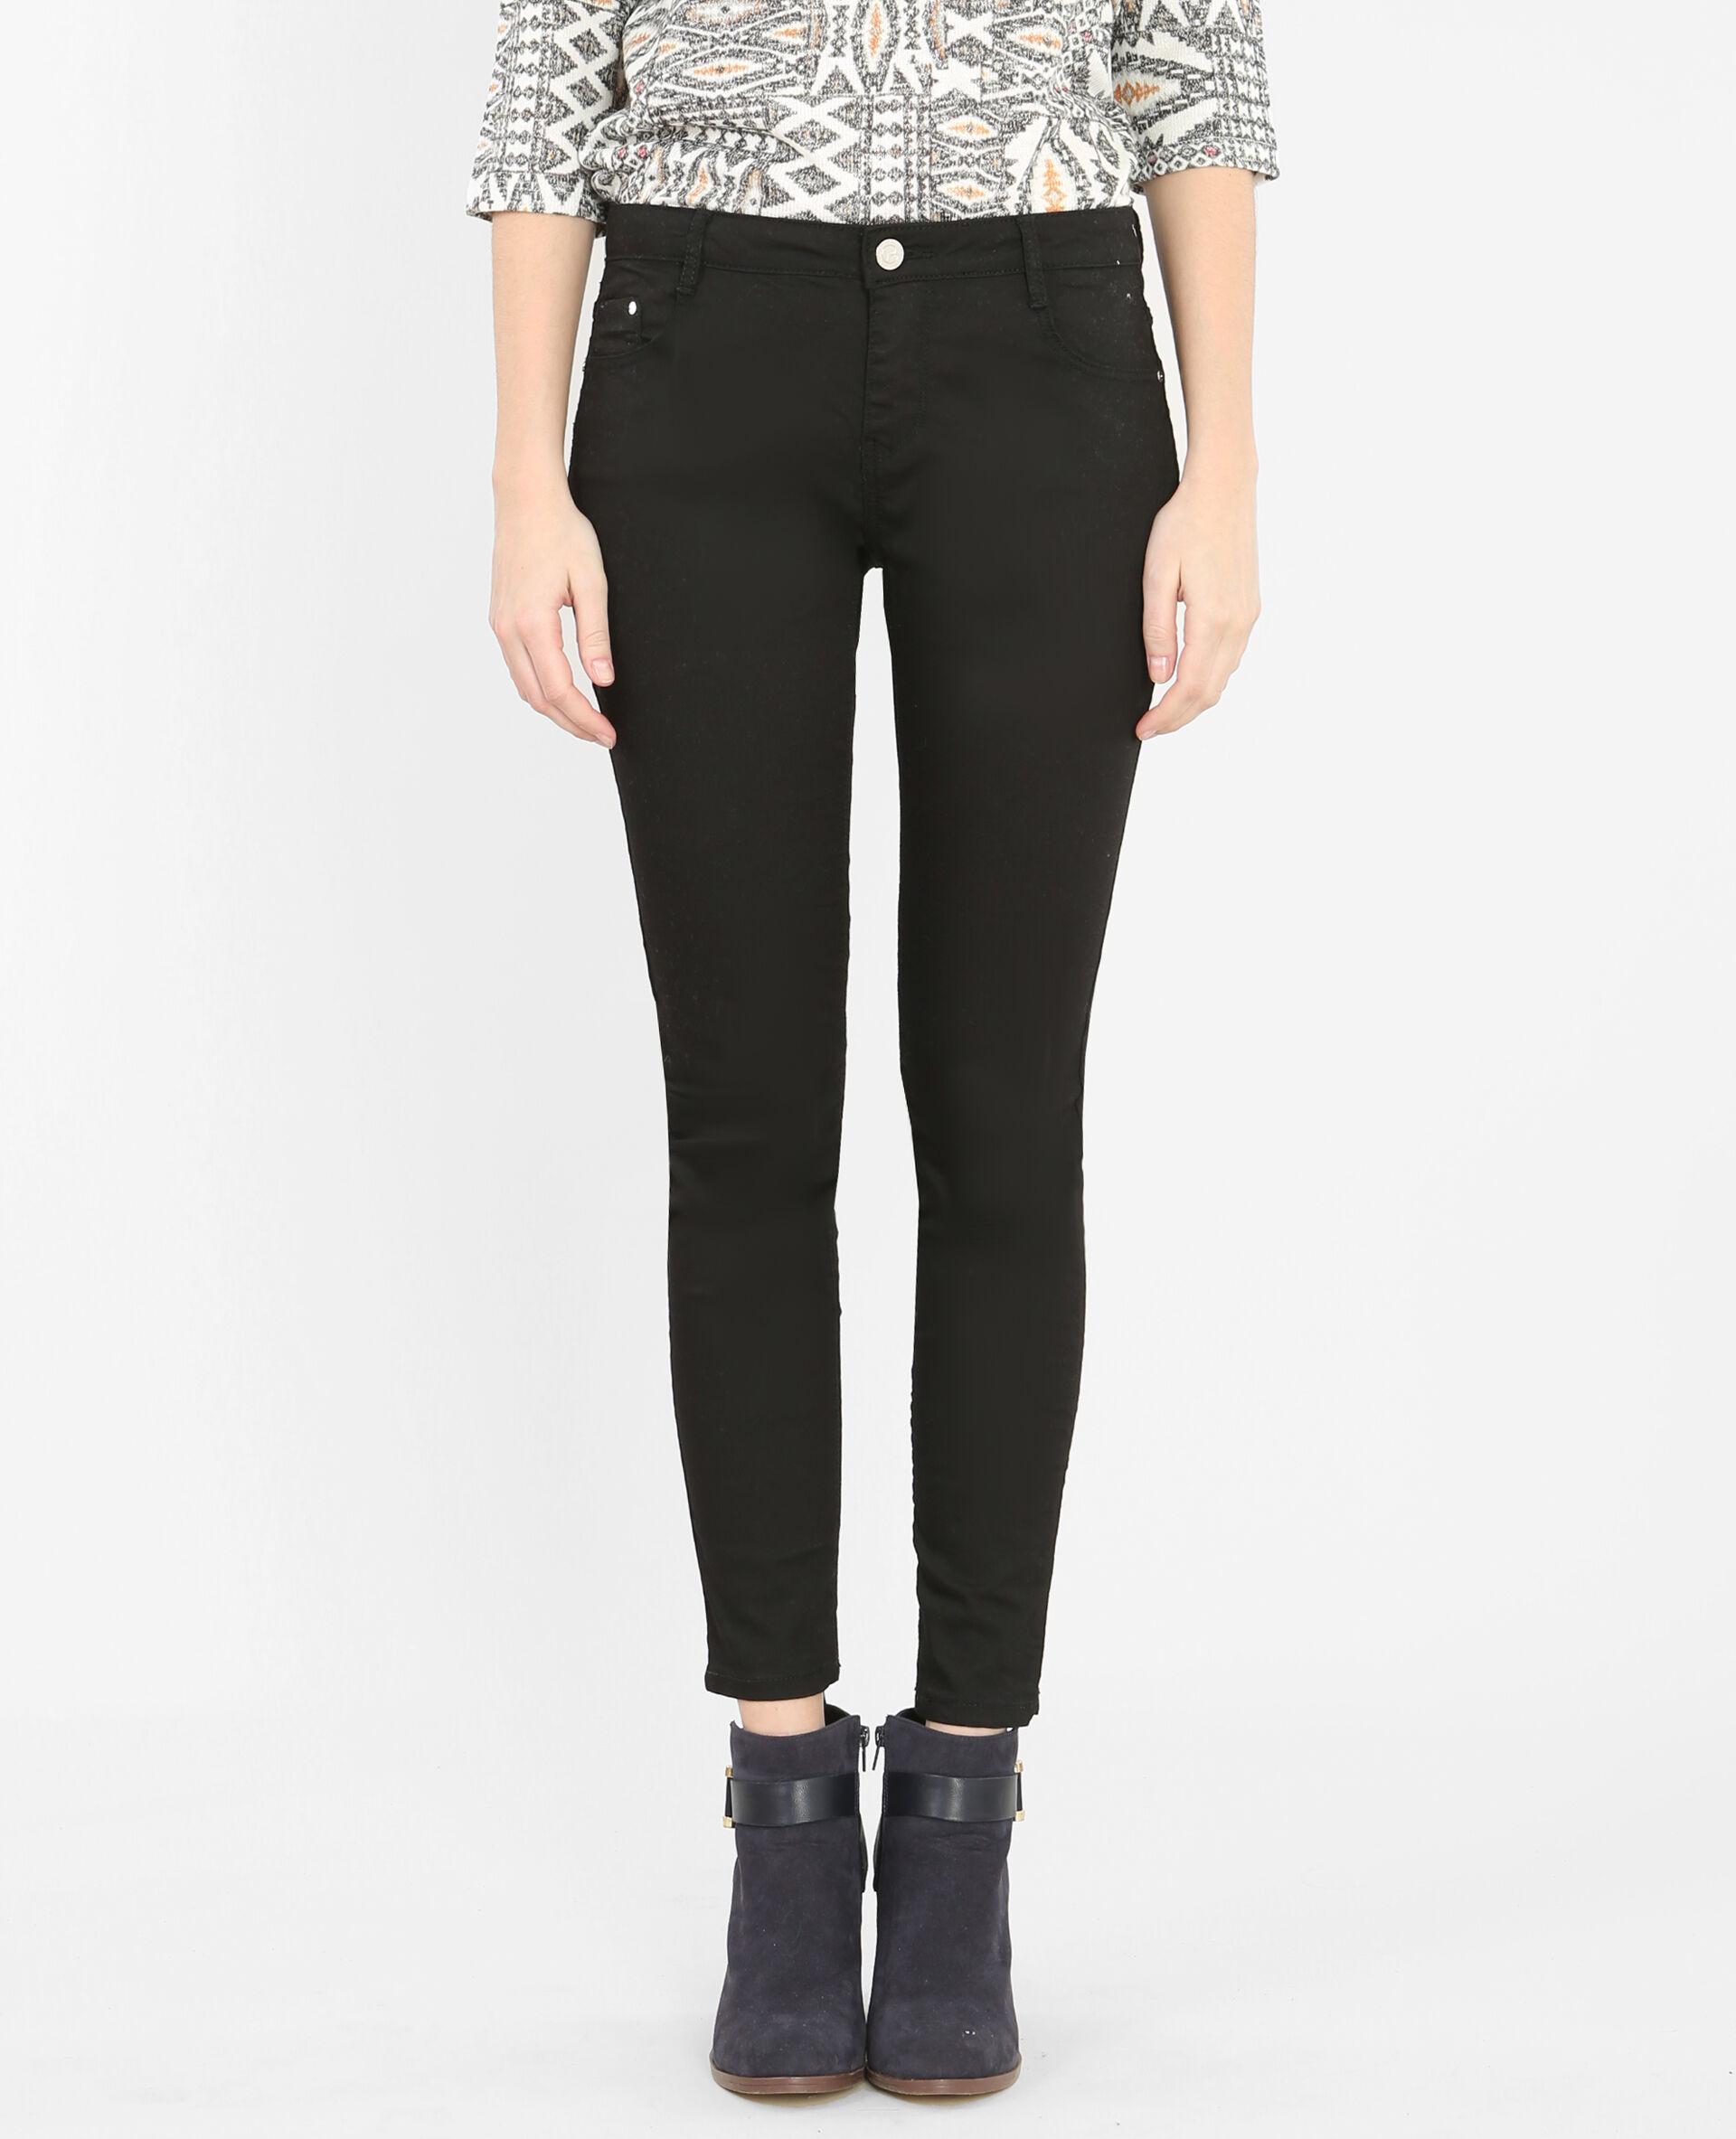 Original 12 Mois Pantalon Souple Imitation Jean Vêtements Filles (0-24 Mois)